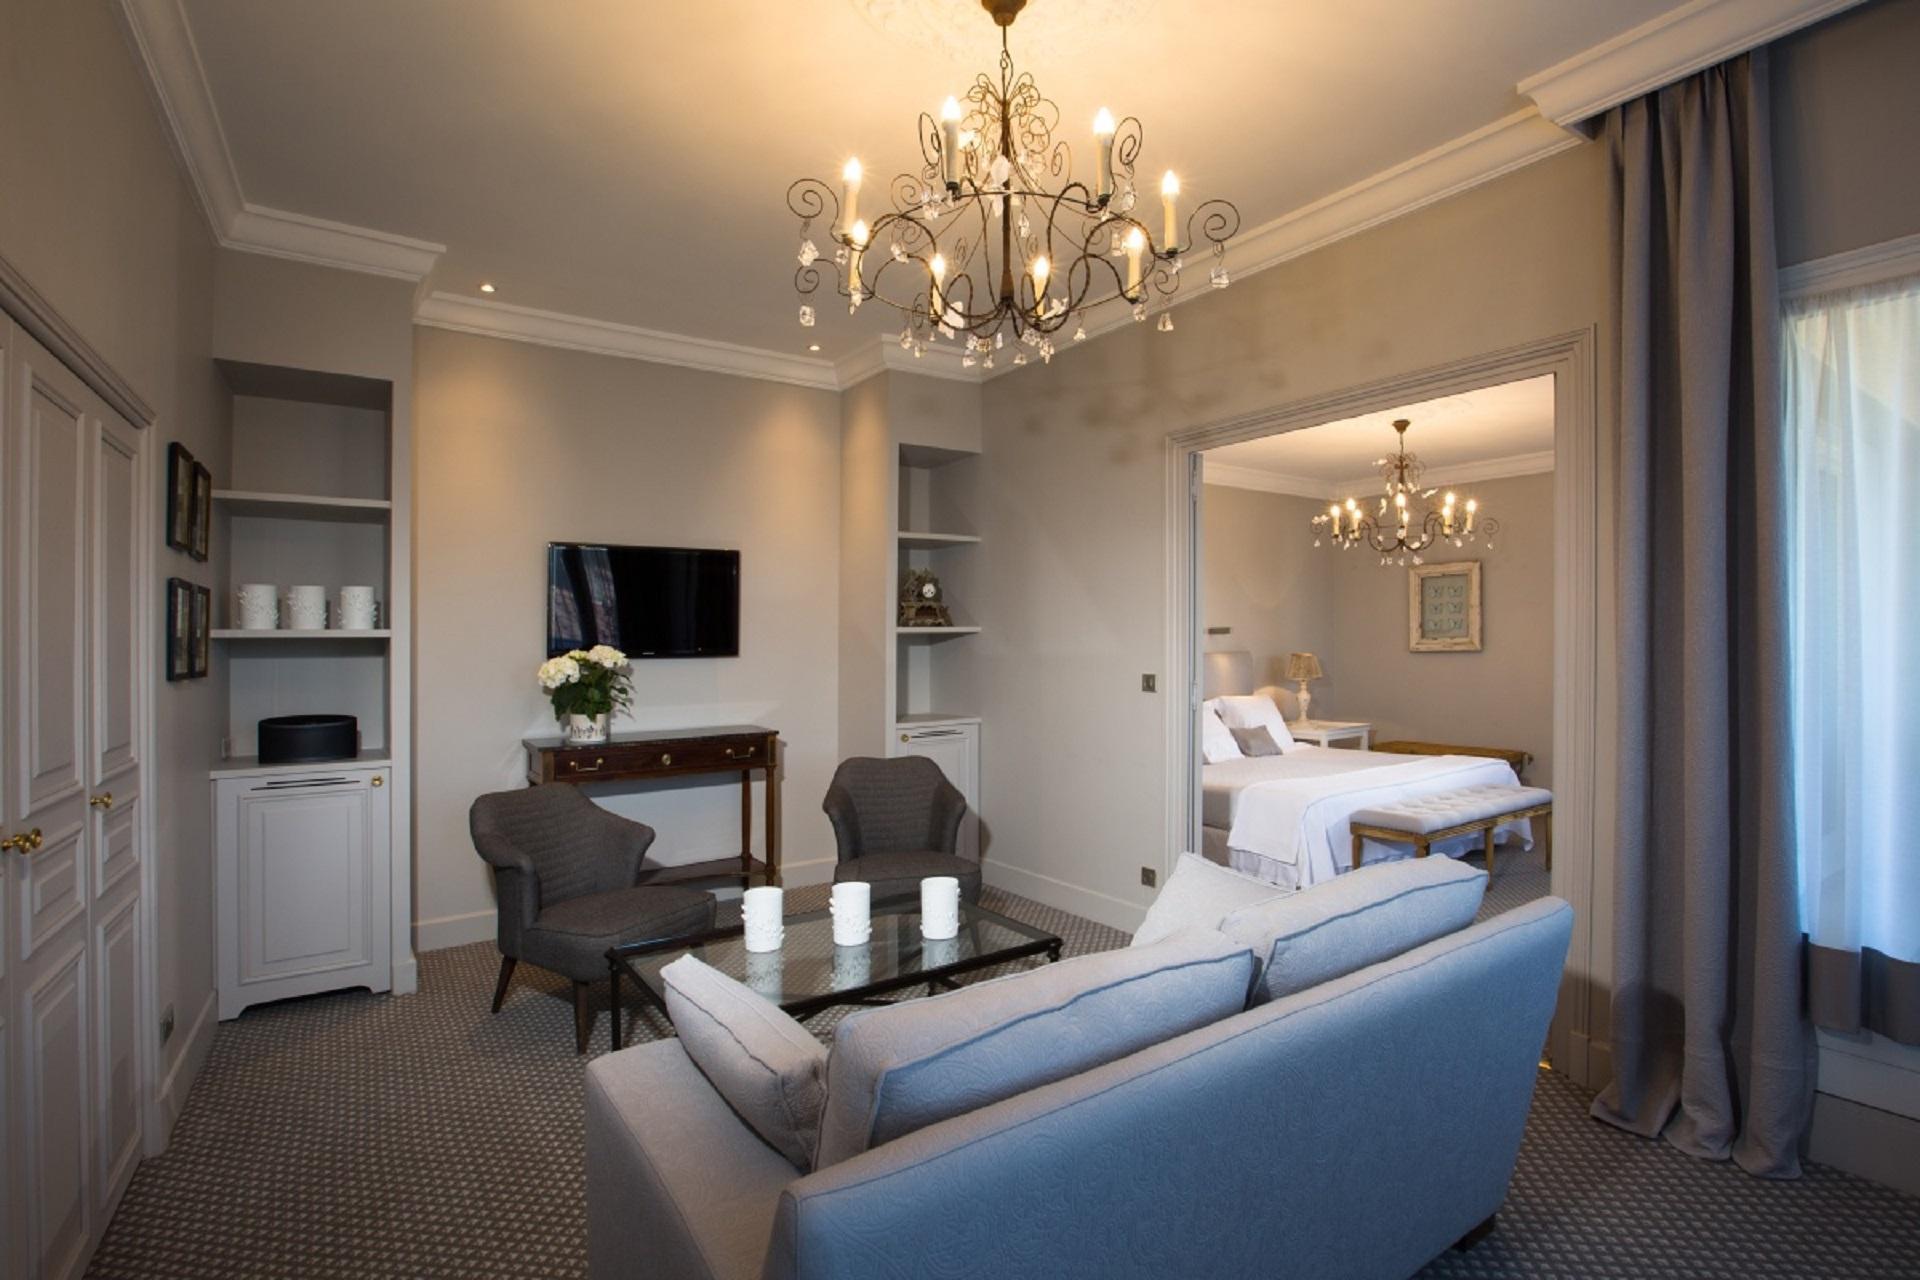 hotel-europe-avignon-provence-luberon-sud-hebergement-seminaires-de-caractere